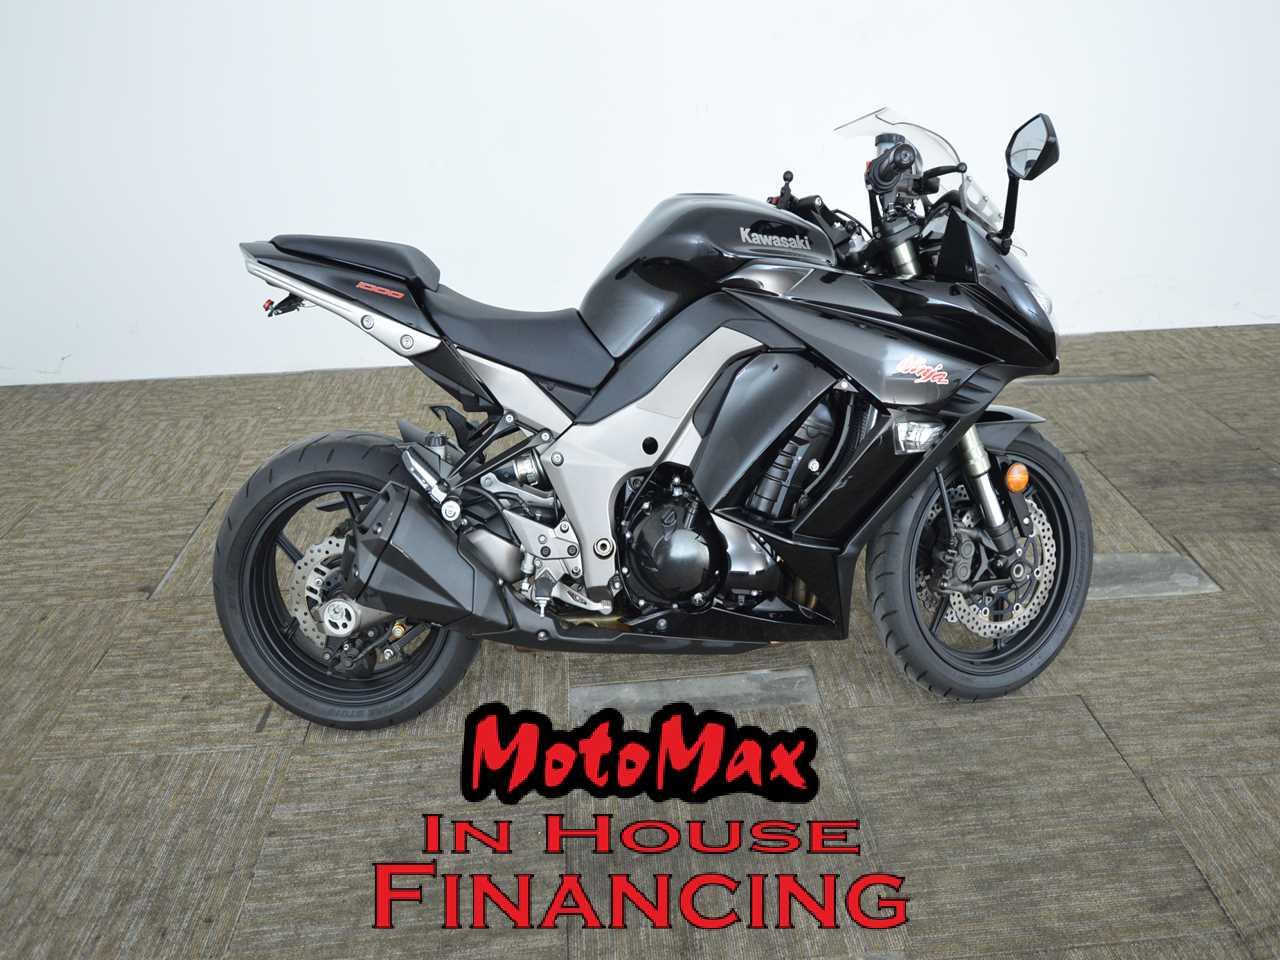 2011 Kawasaki Zx 1000 For Sale In Raleigh Nc Motomax 919 872 7141